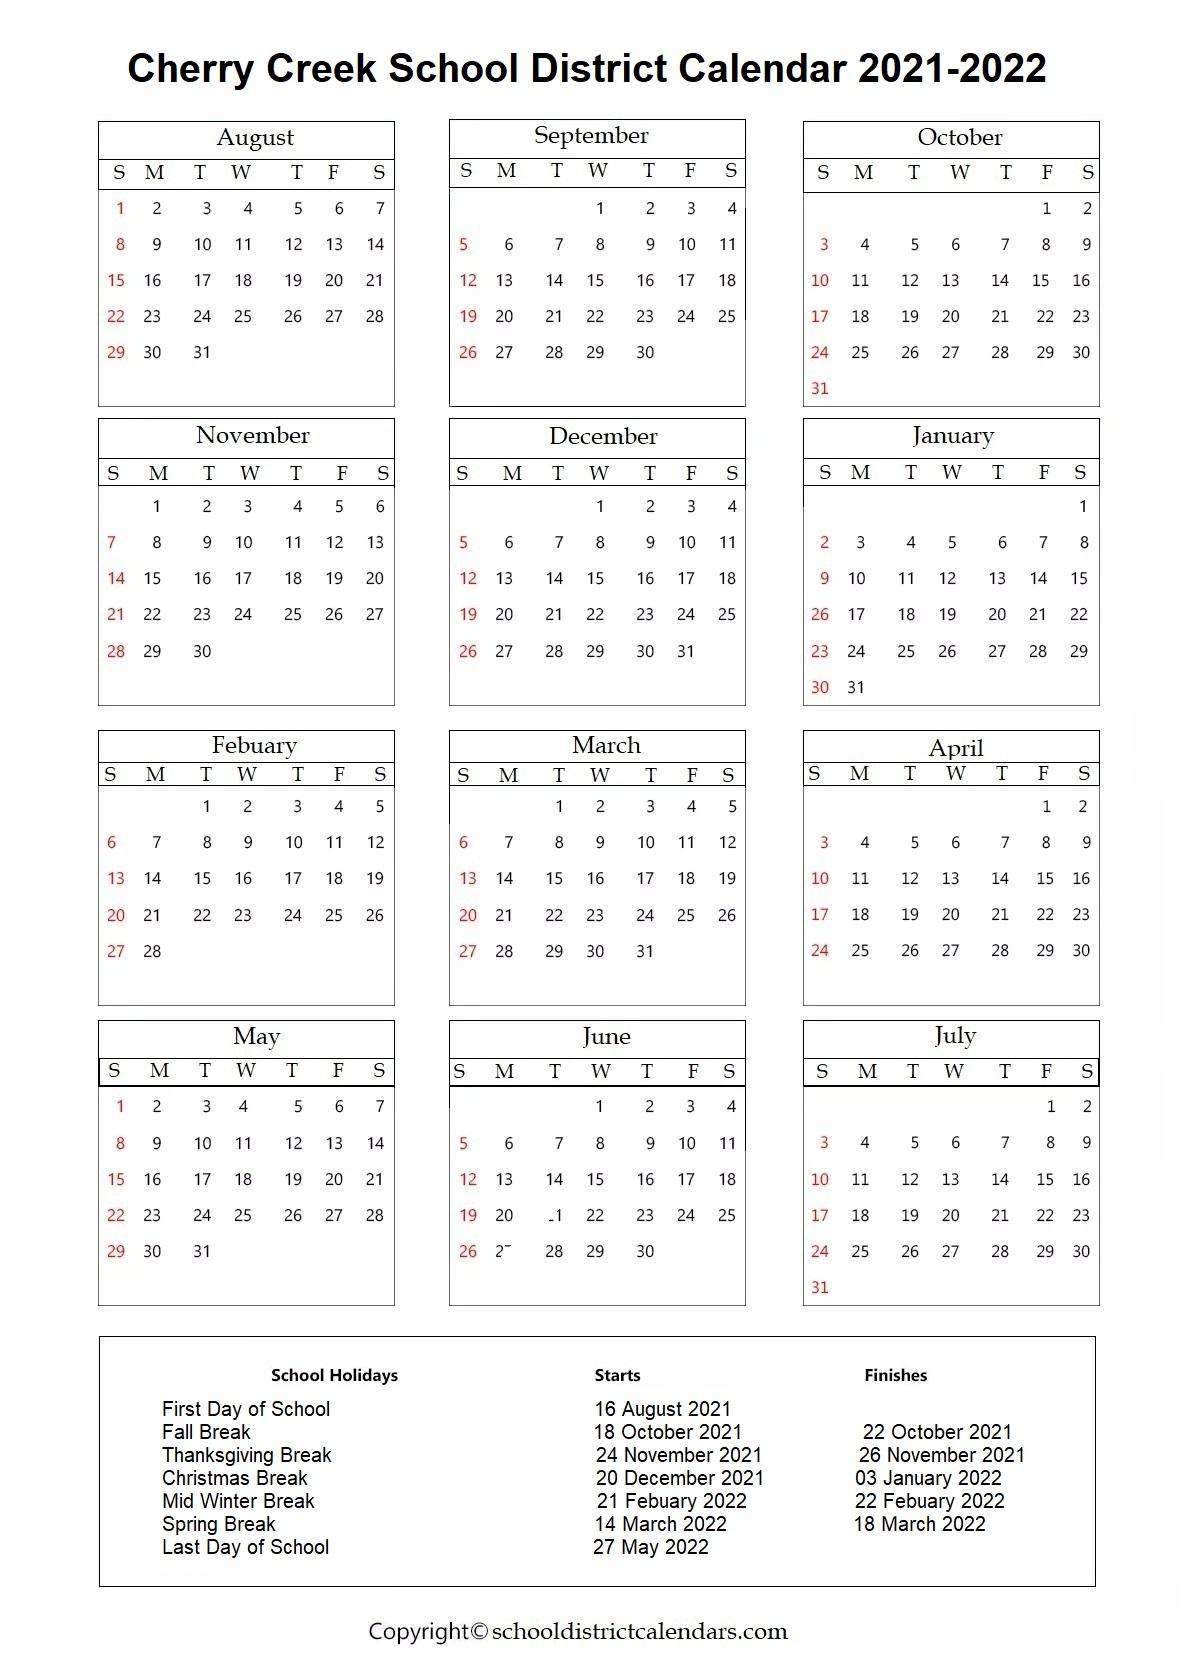 Cherry Creek School District, Colorado Calendar Holidays 2021-2022